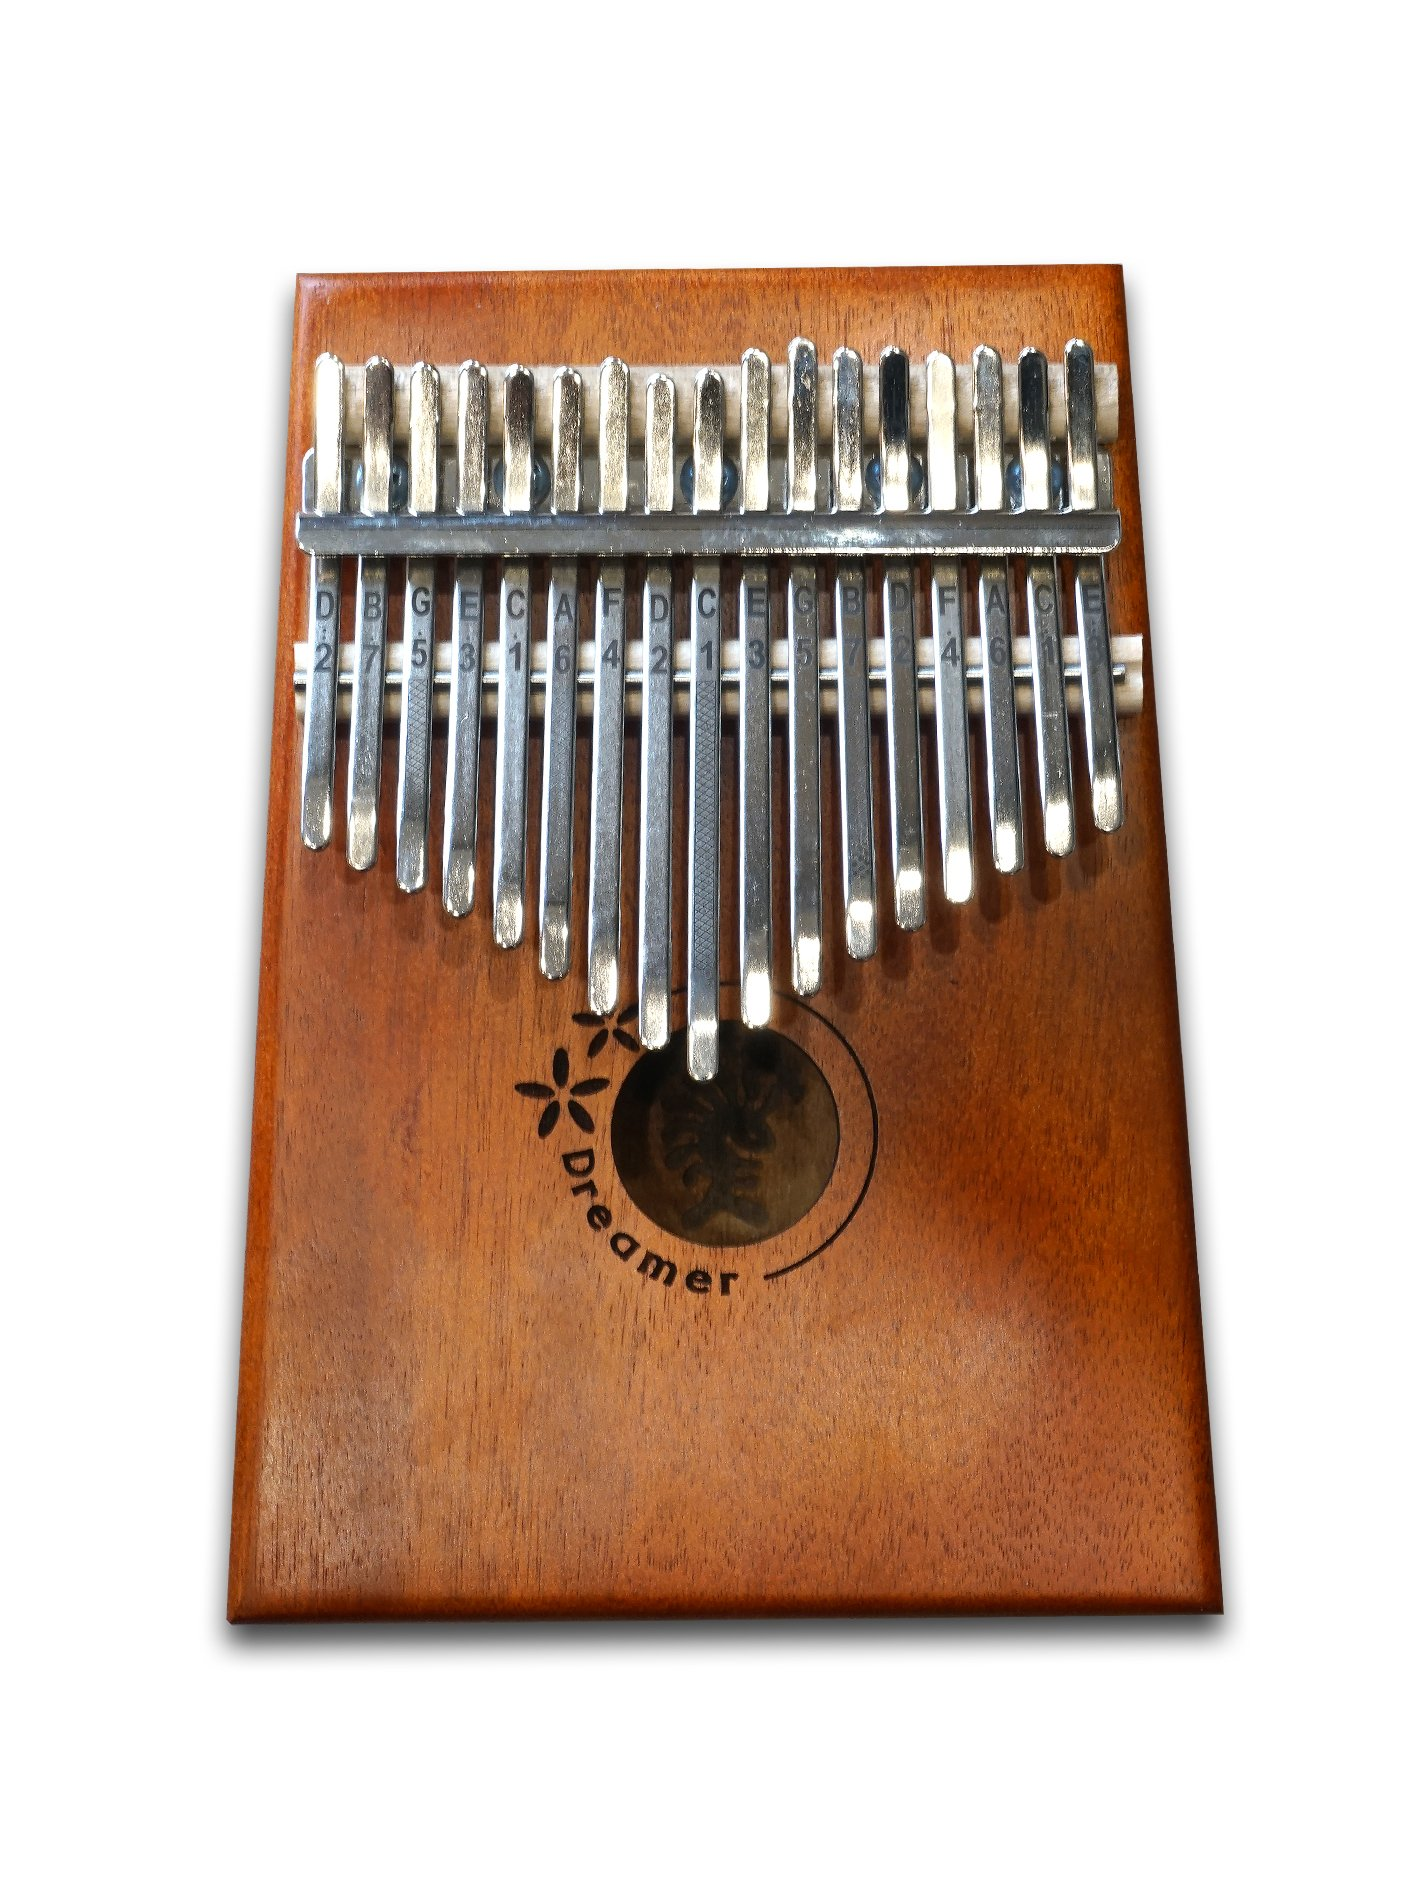 17-Keys Kalimba Thumb Piano, Koa wood Body, Metal keys by DREAMER